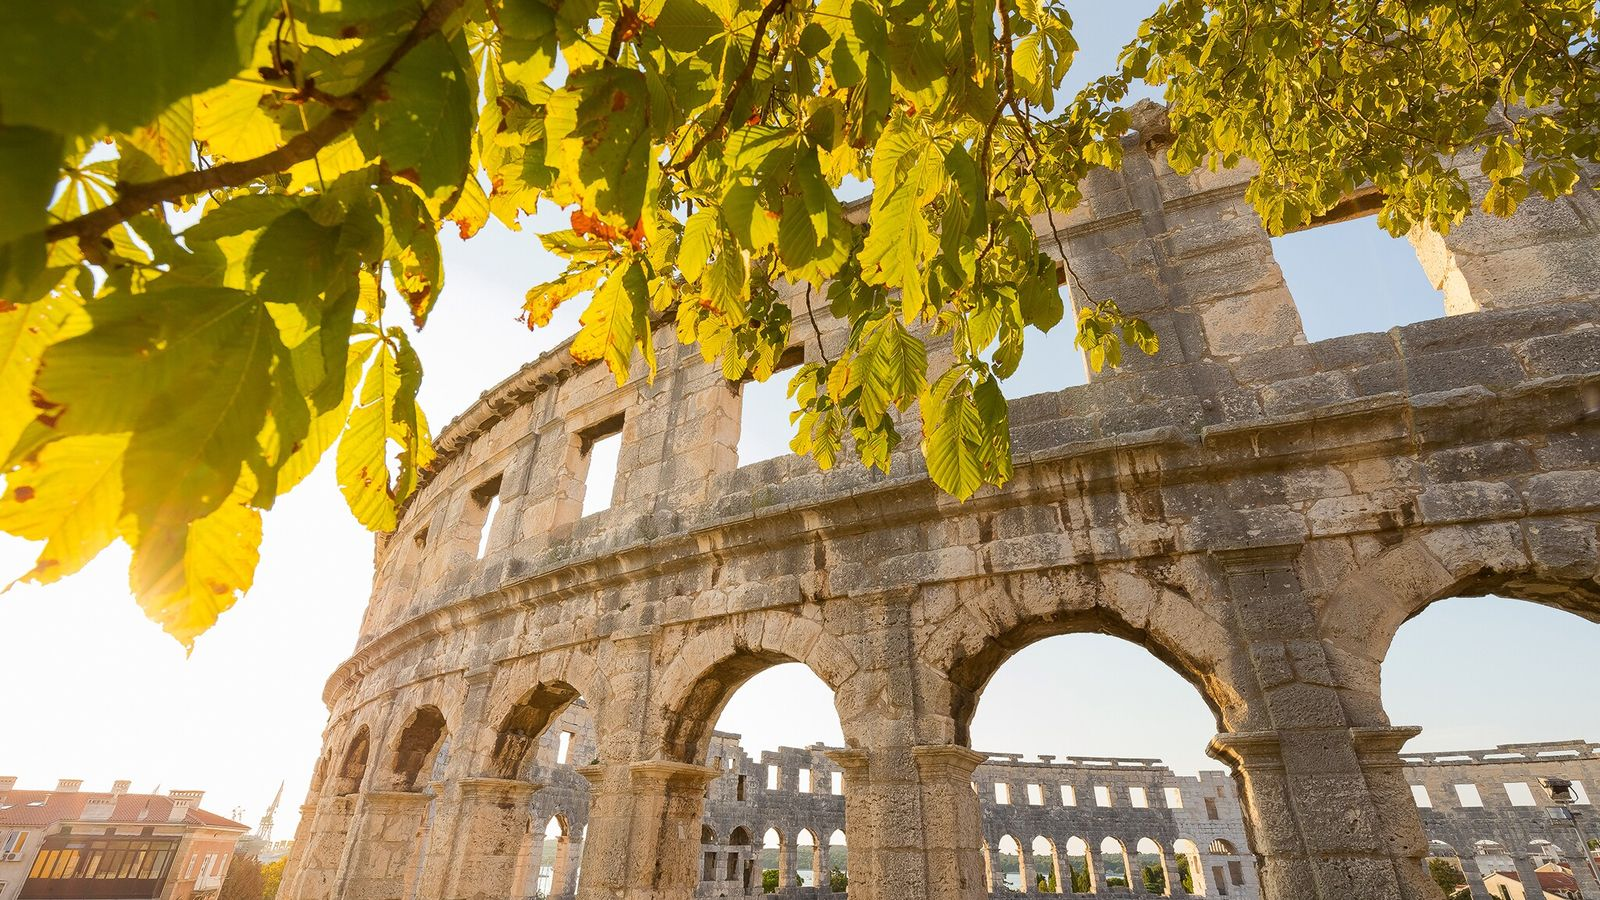 Pula Arena, a Roman amphitheatre that still hosts events today.